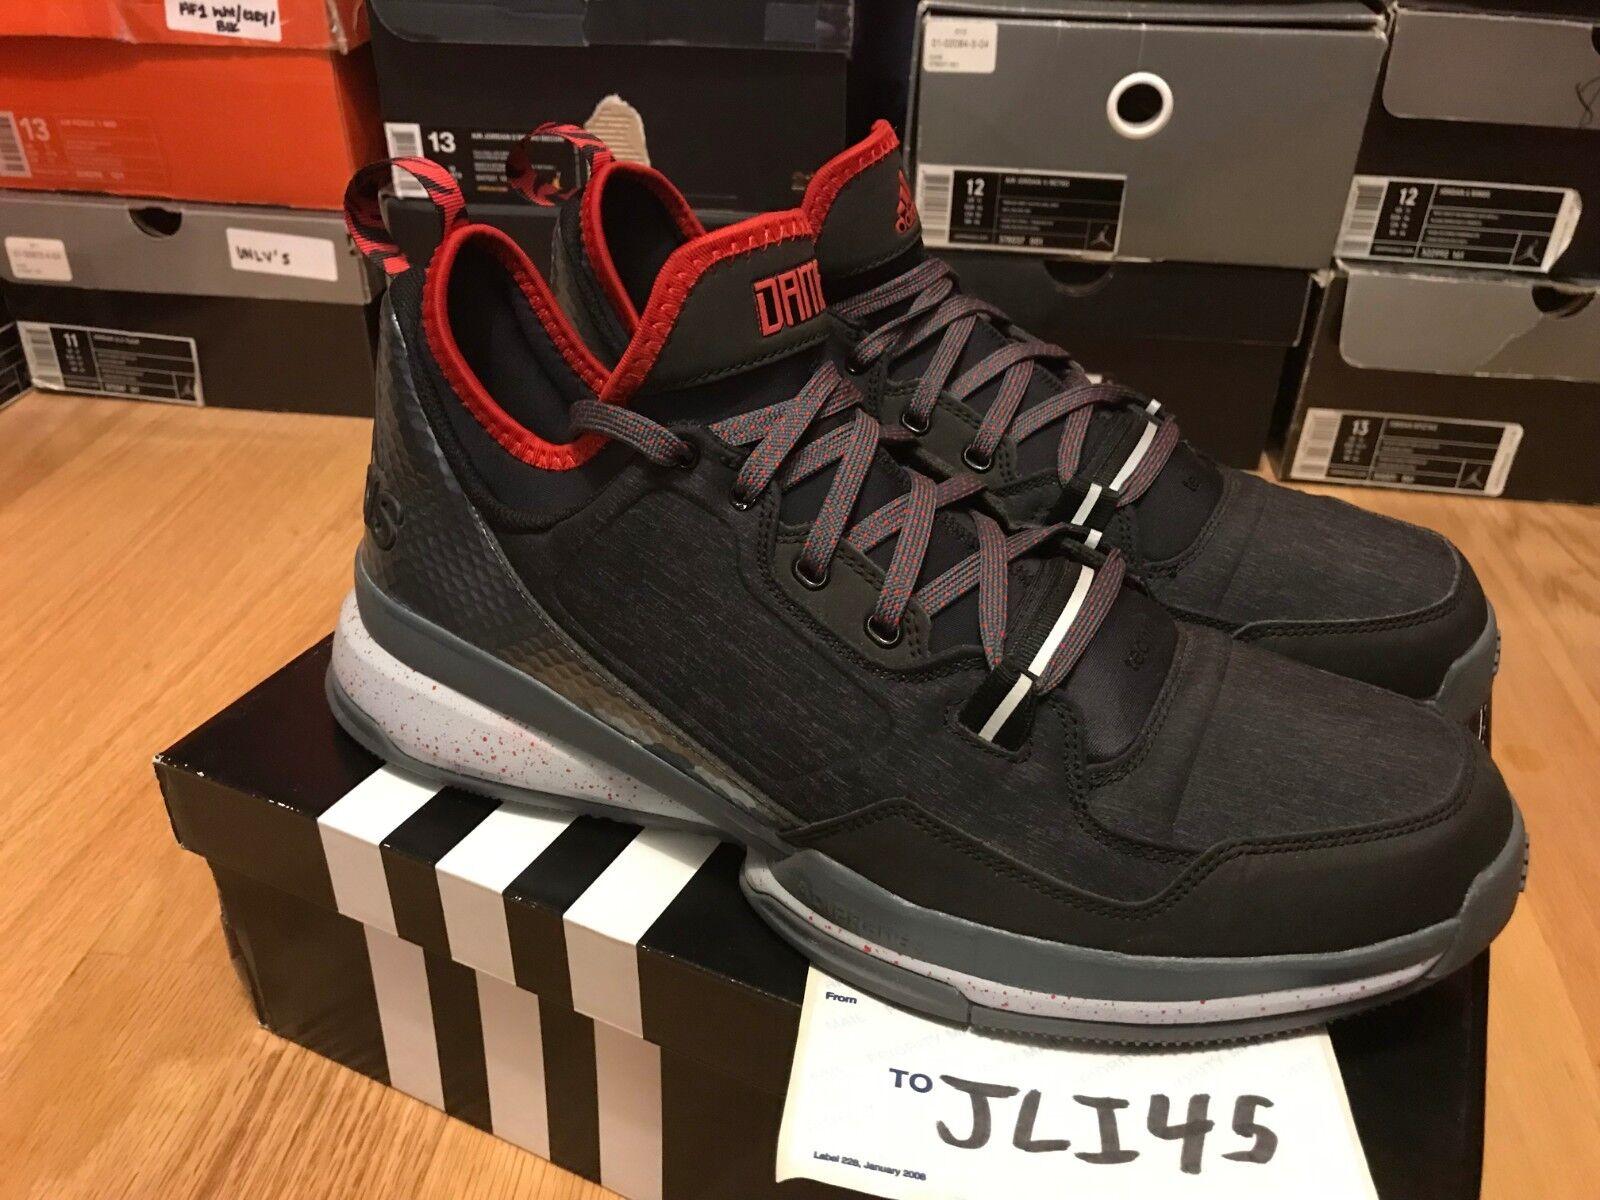 Men's Adidas Damian Lillard D Lillard 1 Size 13 shoes Sneakers Boost Crazy Ultra